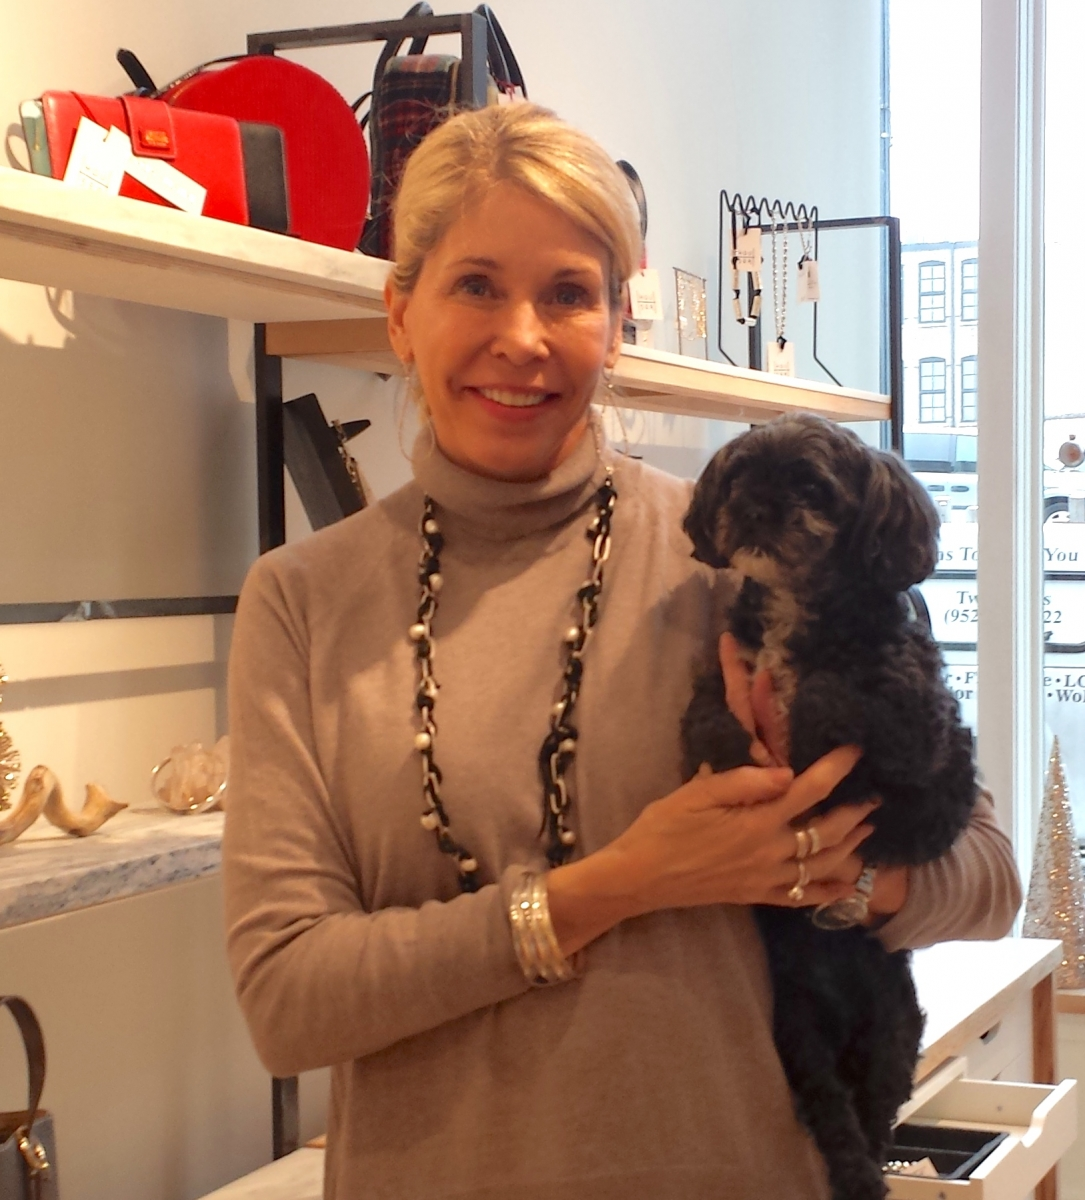 Denise Houser and her dog, Rudy. Photo by Lianna Matt.